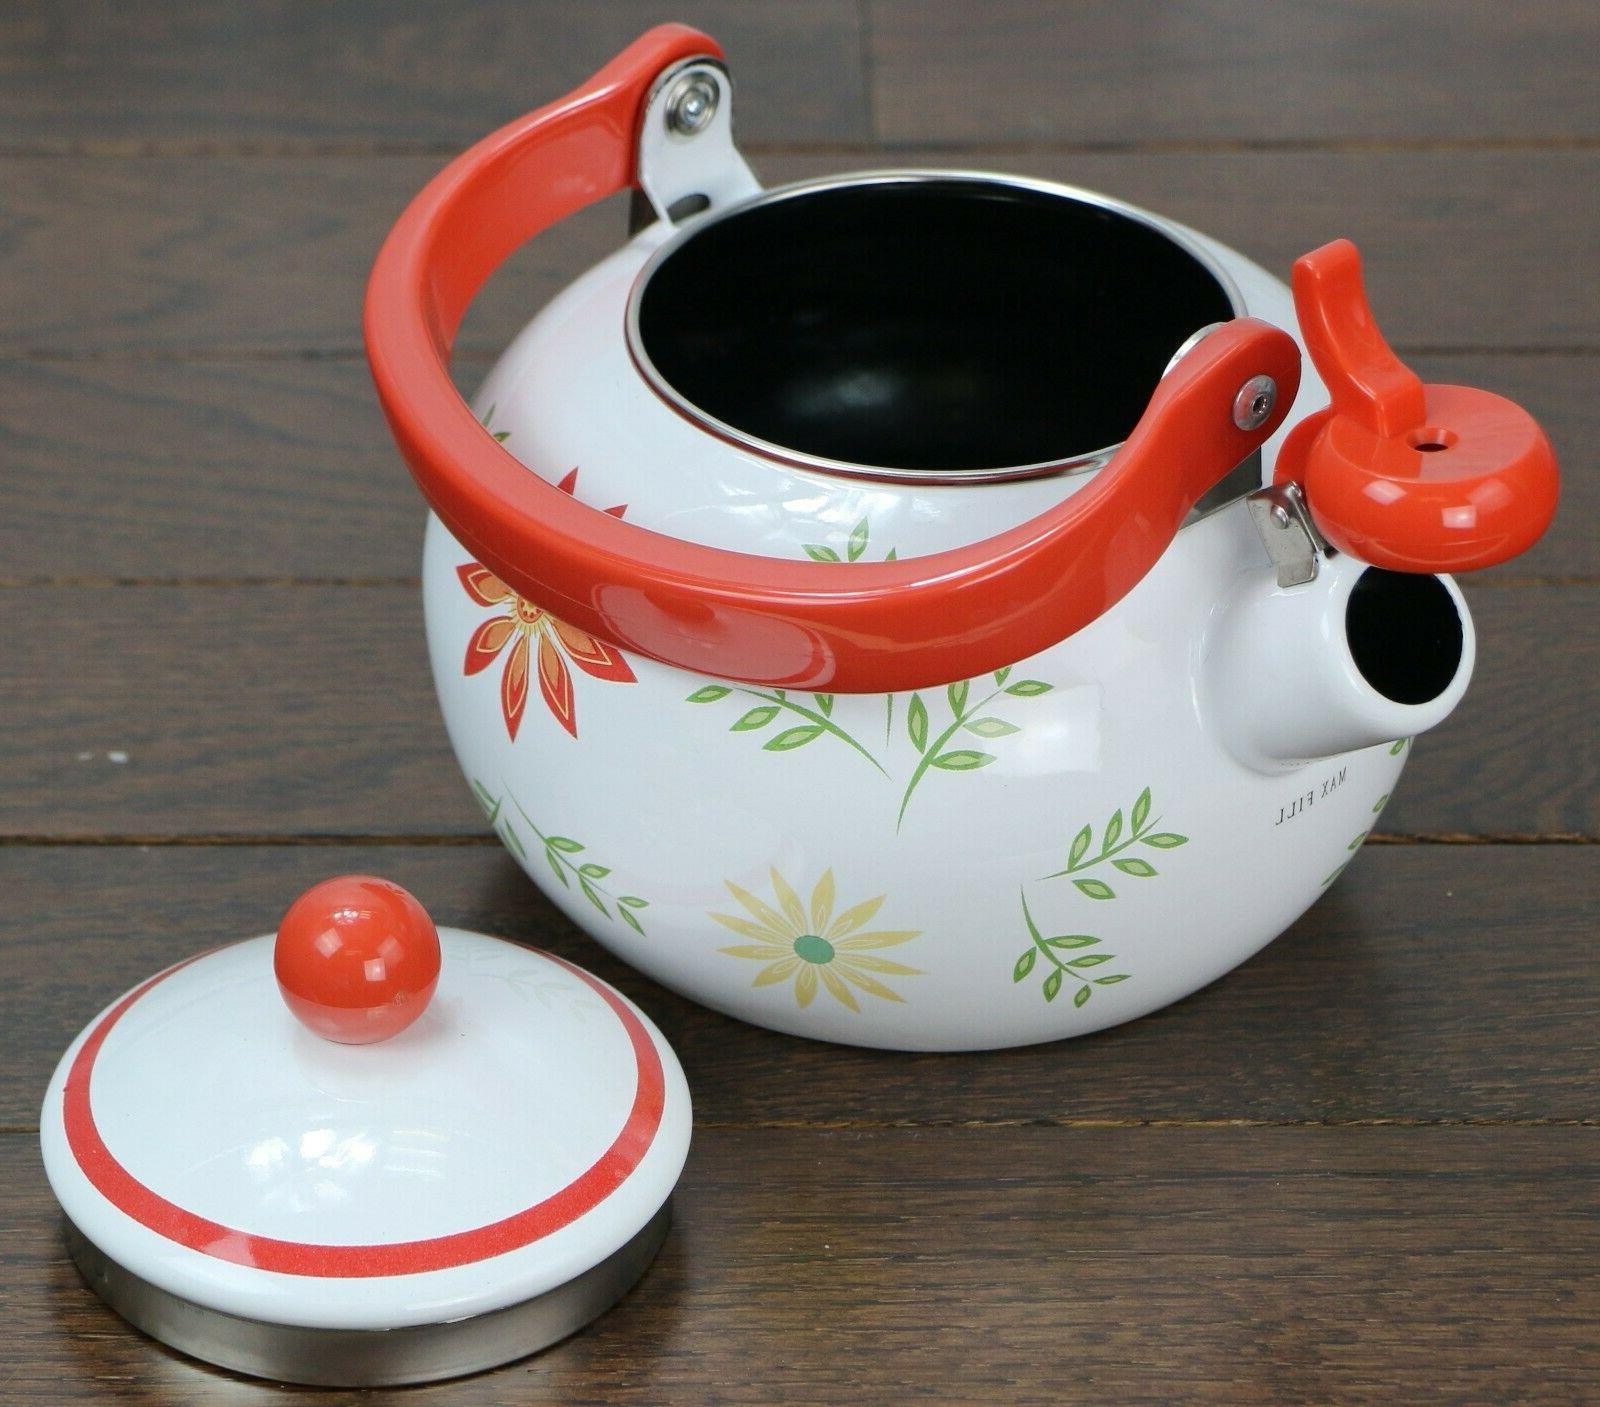 CORELLE TEA KETTLE STOVETOP Safe Your Pattern